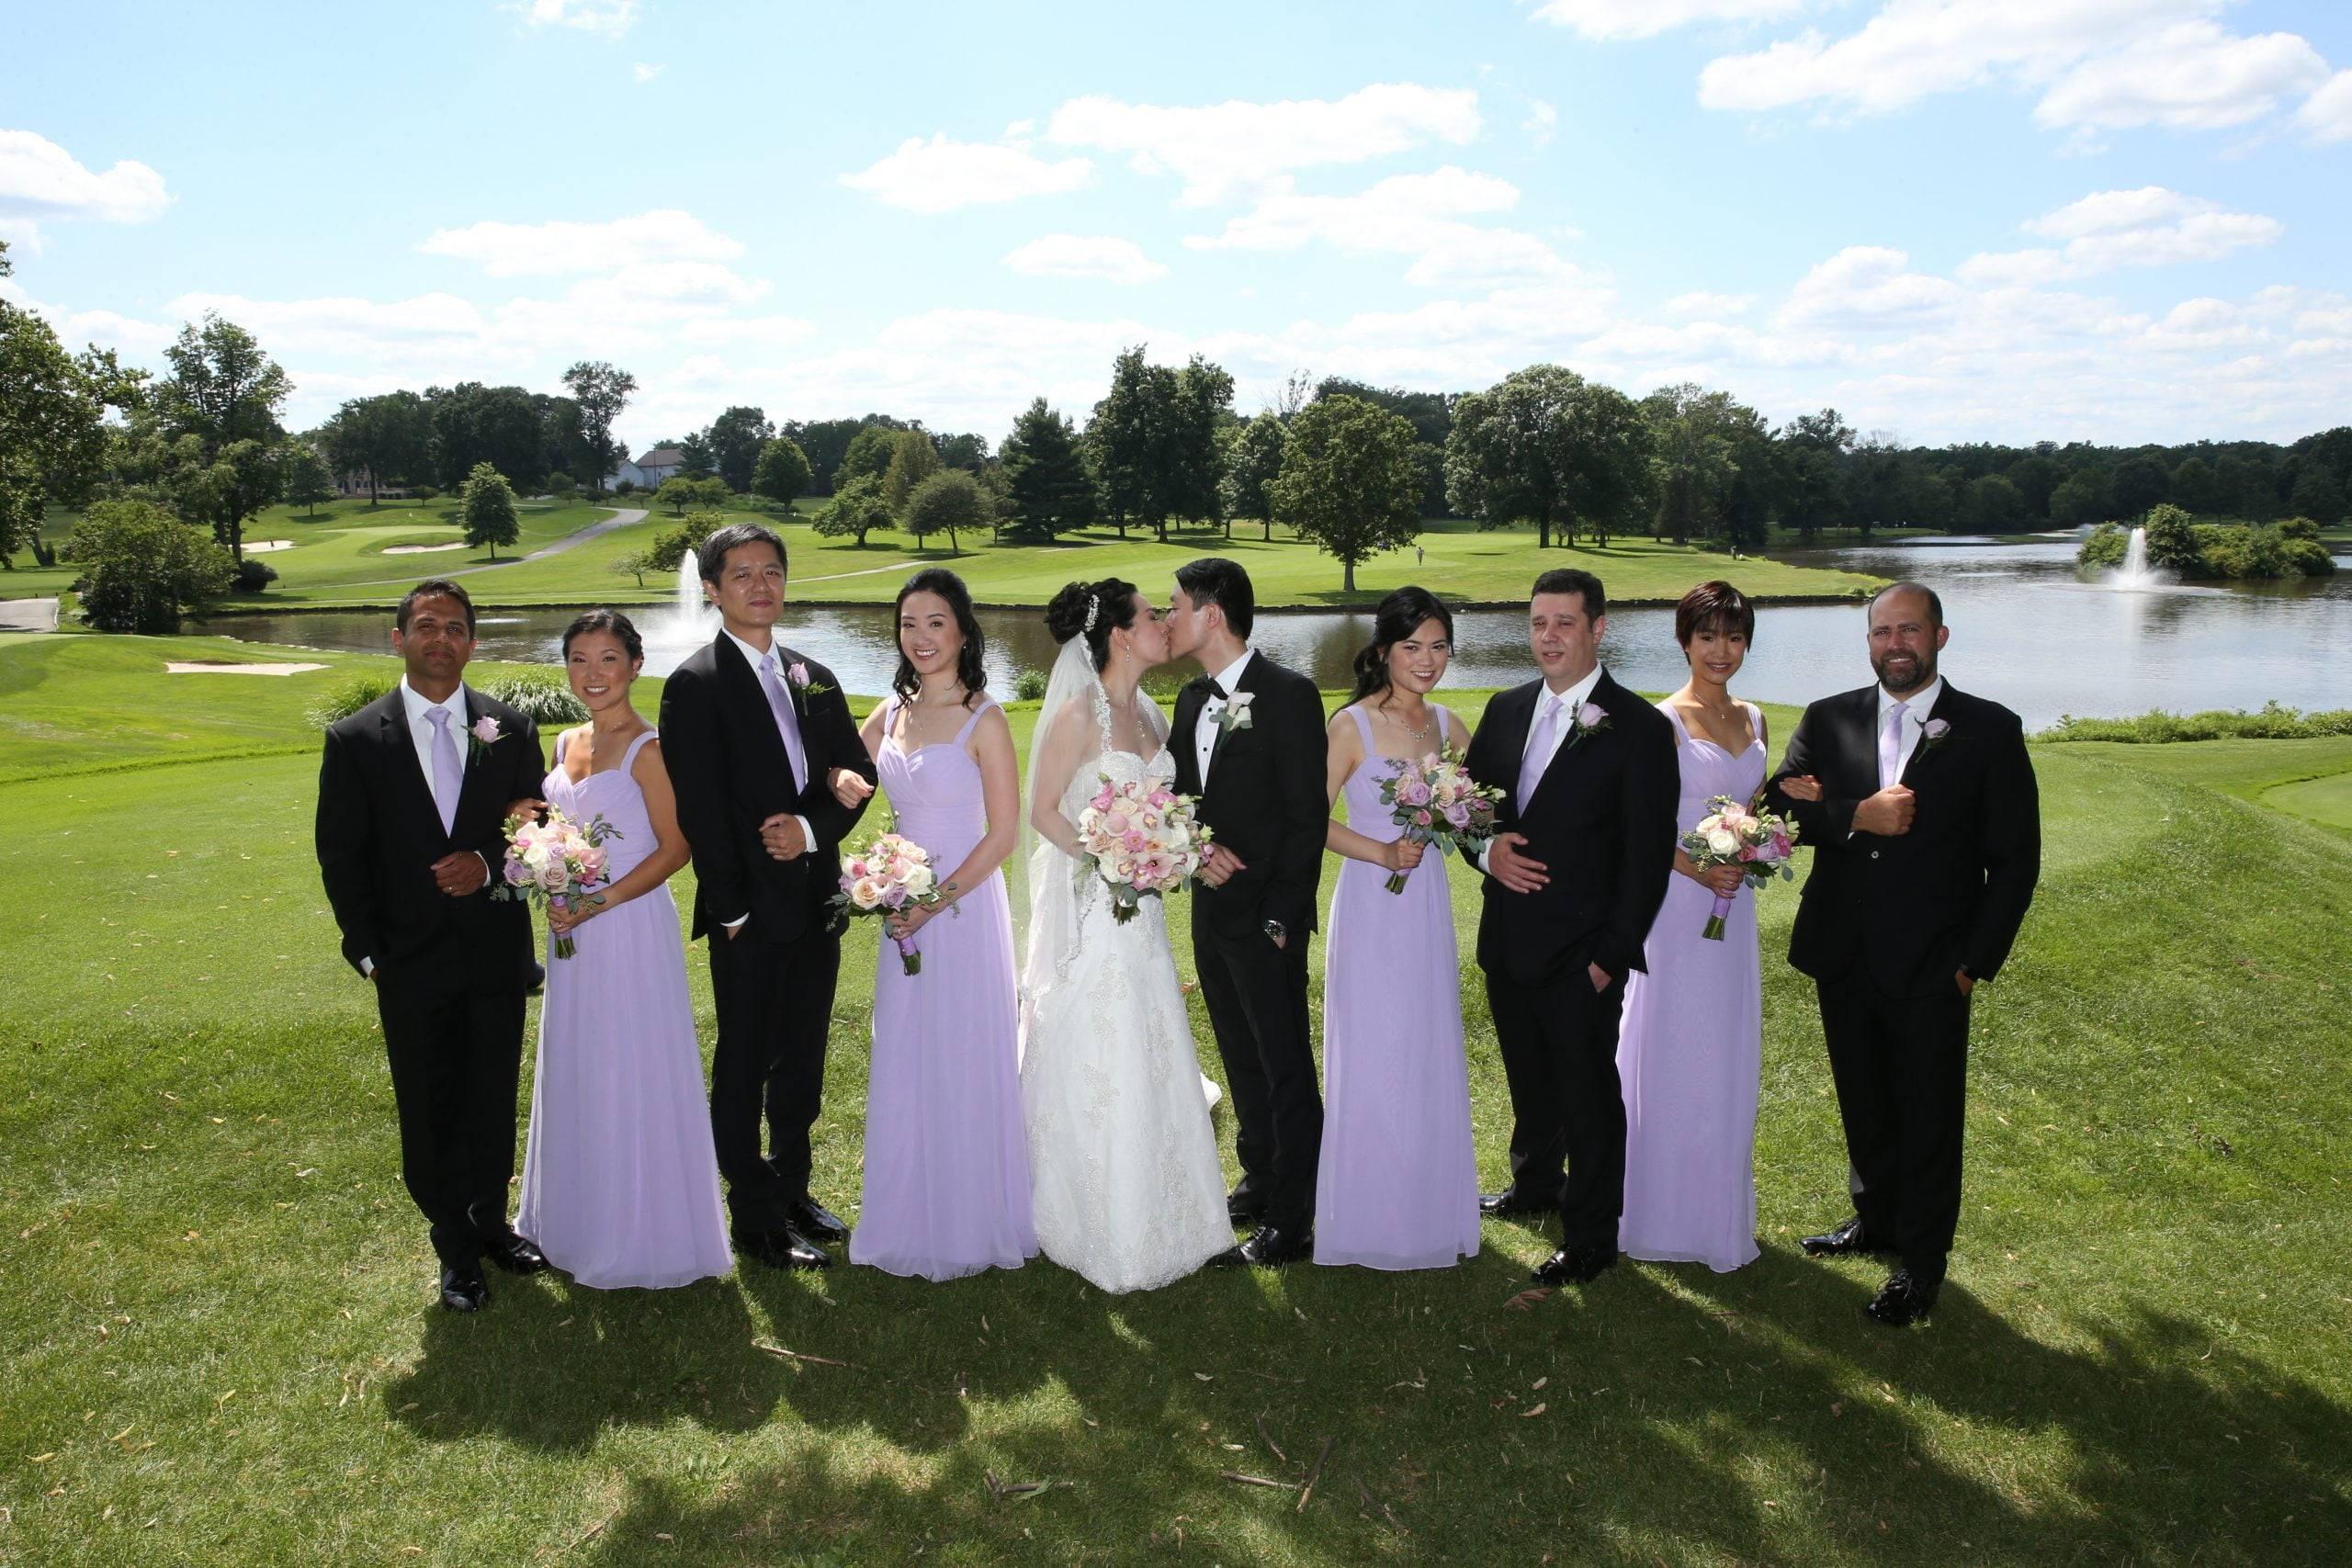 Brooklake bridal party by the lake